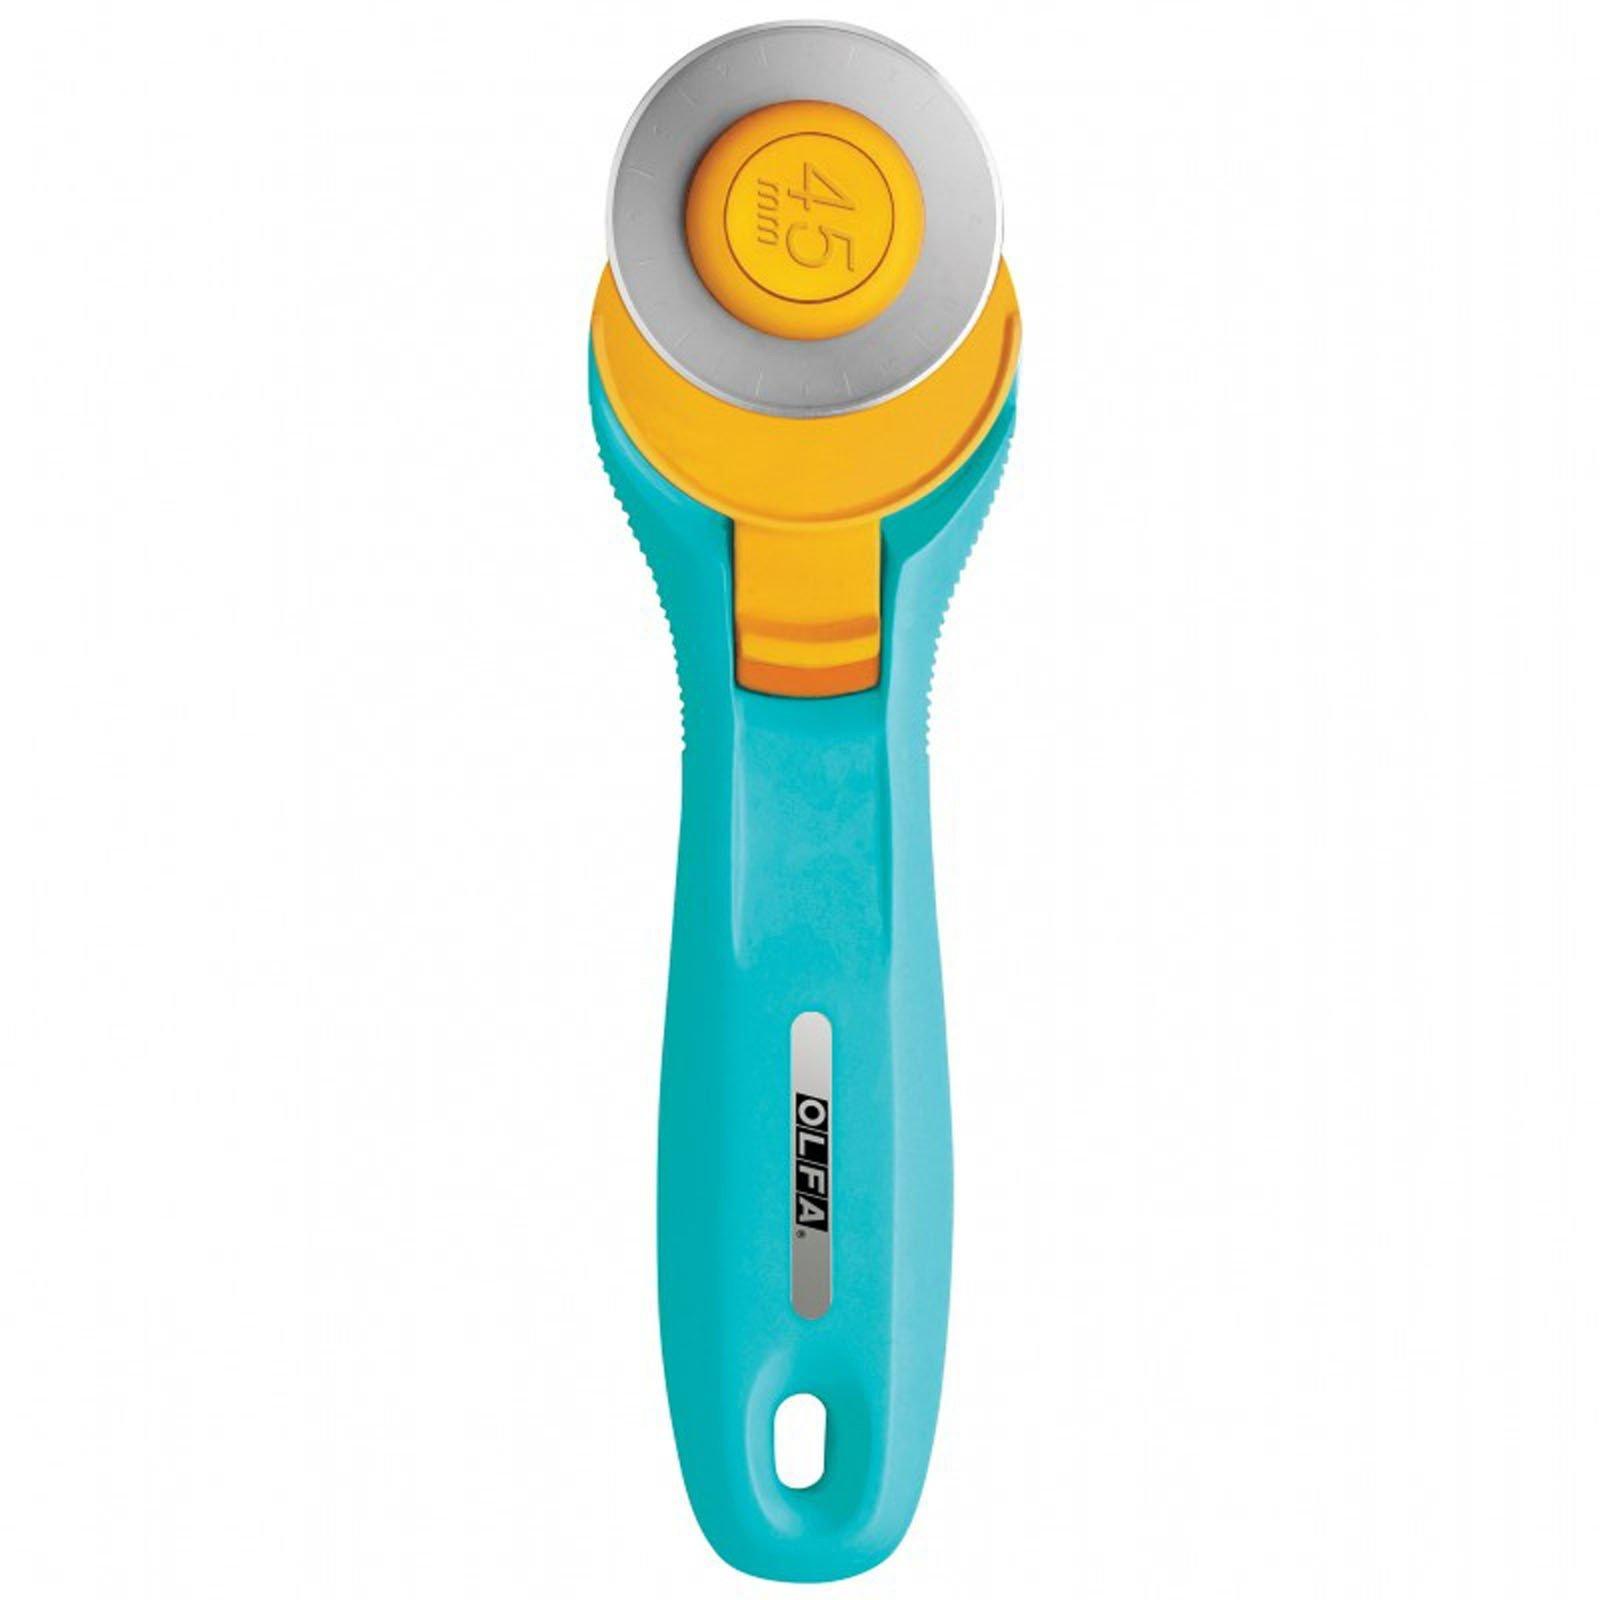 Olfa Splash Rotary Cutter - Aqua